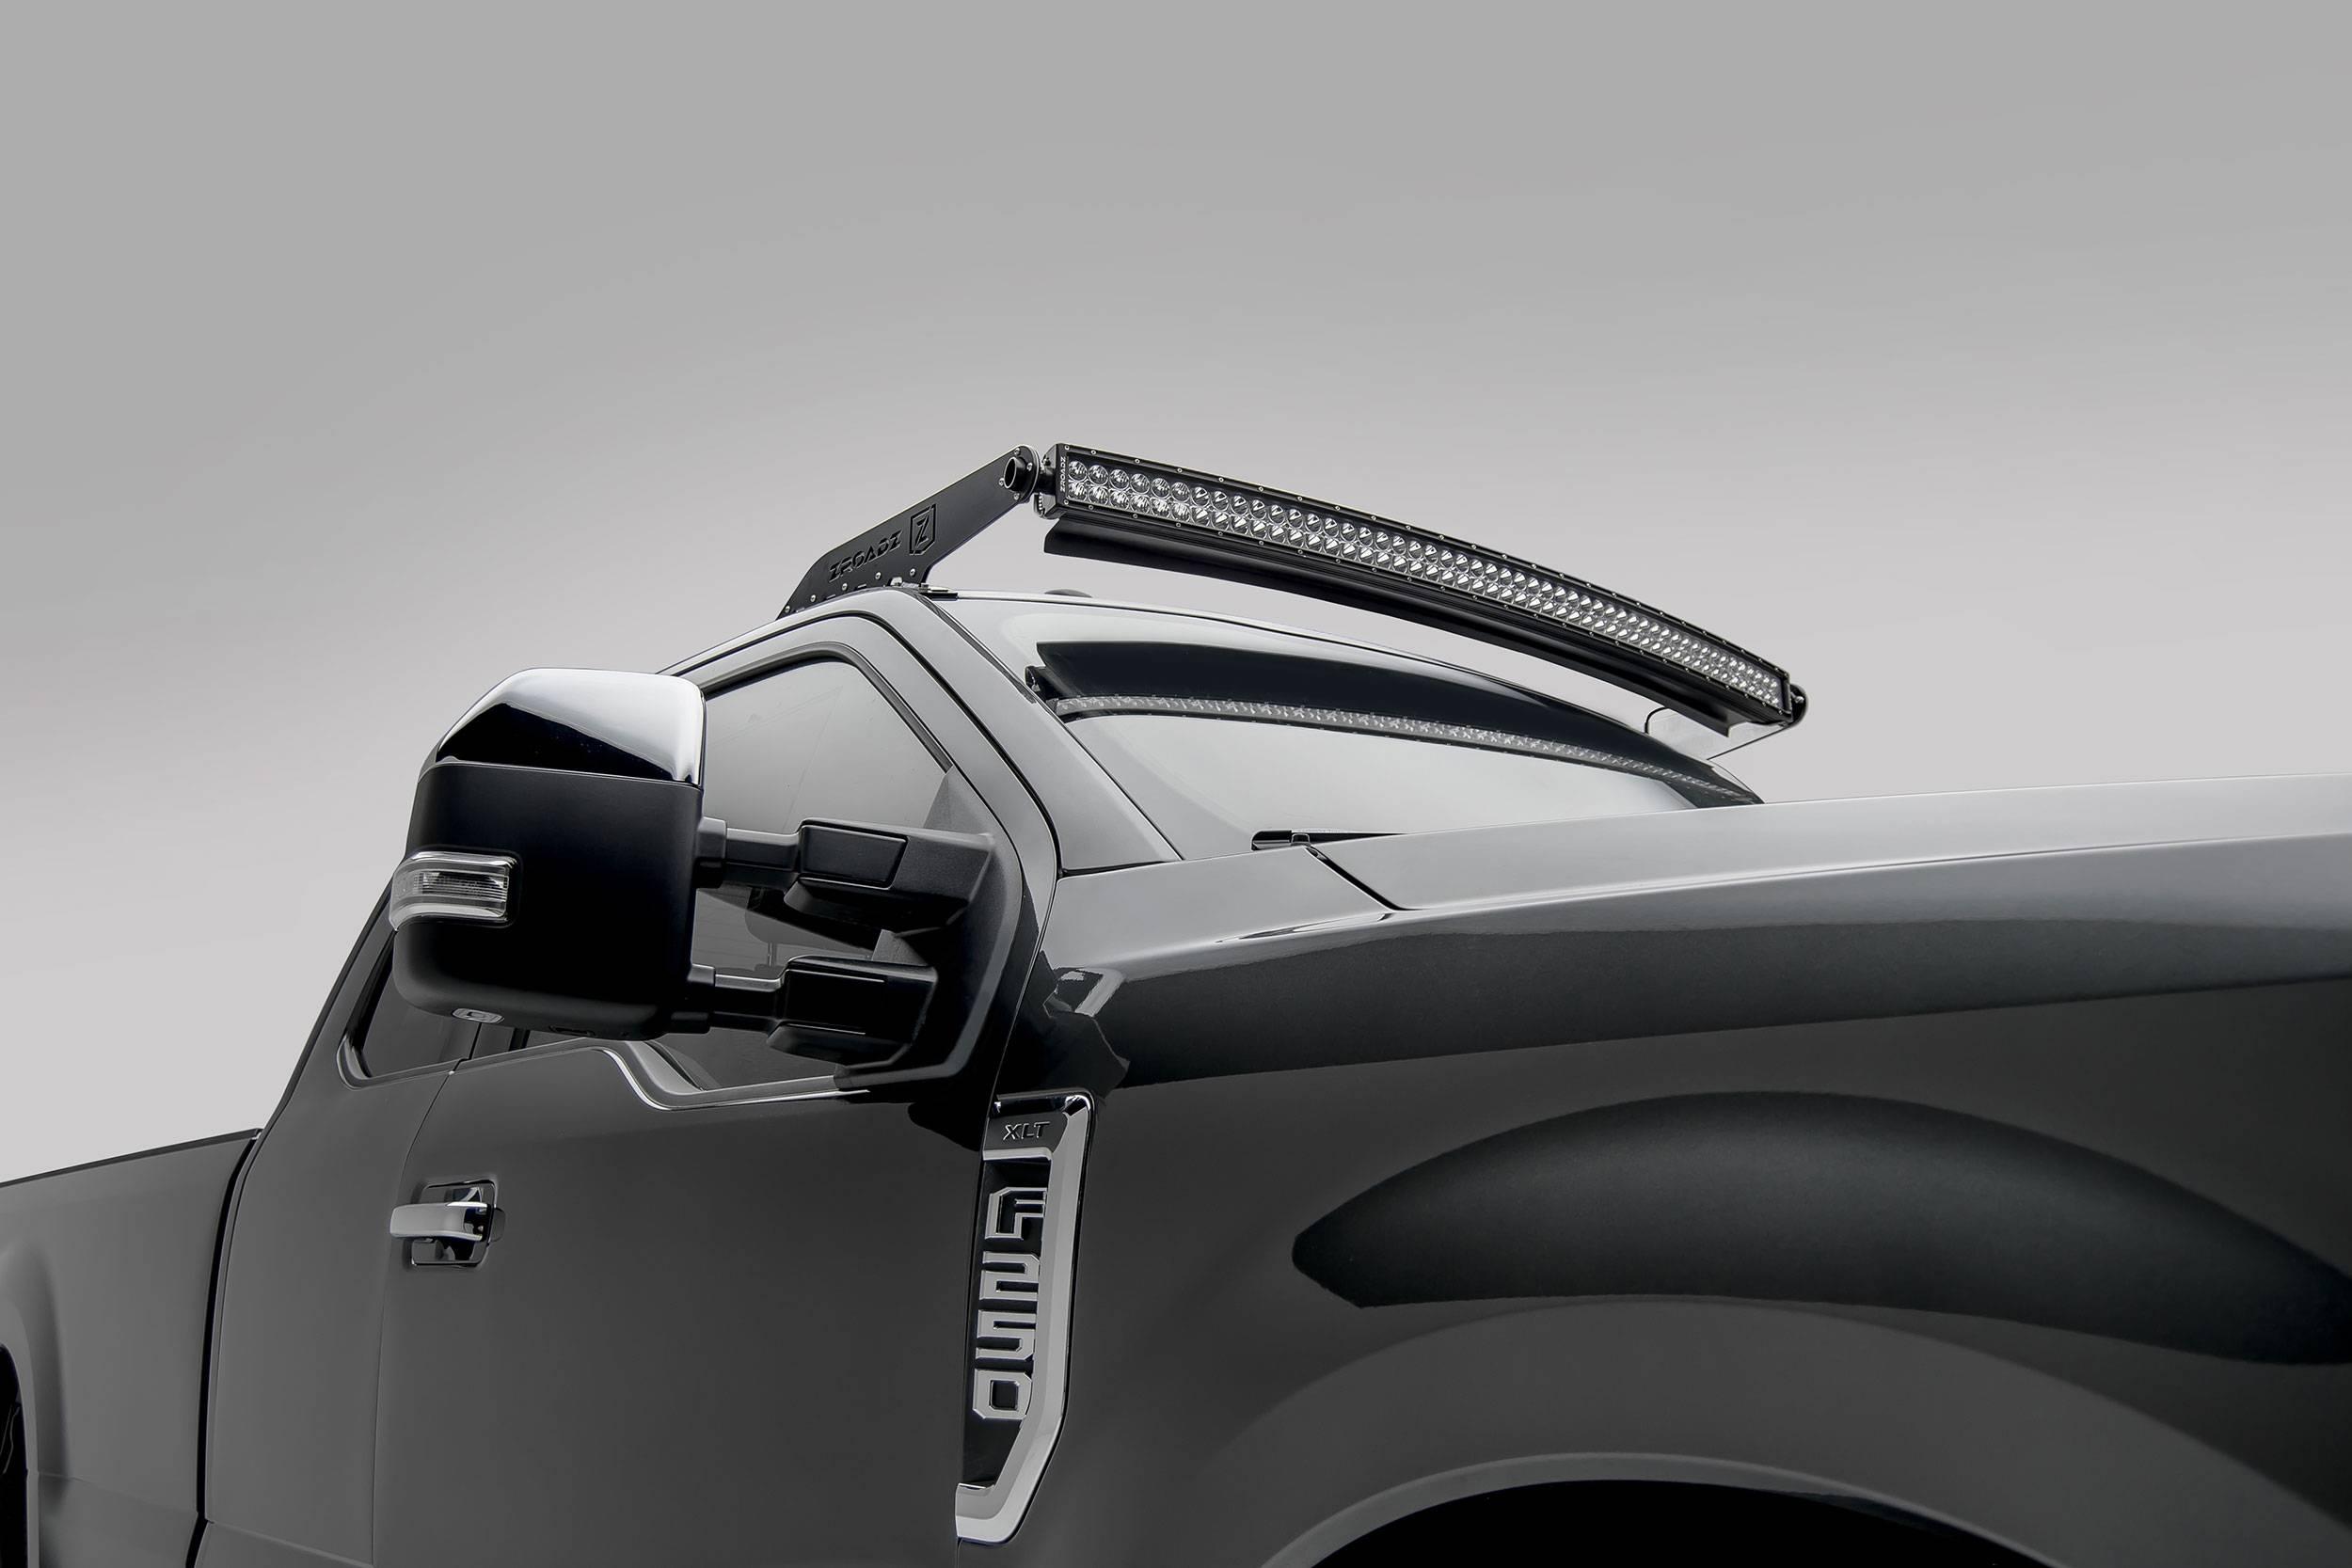 2017-2021 Ford Super Duty Front Roof LED Bracket to mount (1) 52 Inch Curved LED Light Bar - PN #Z33